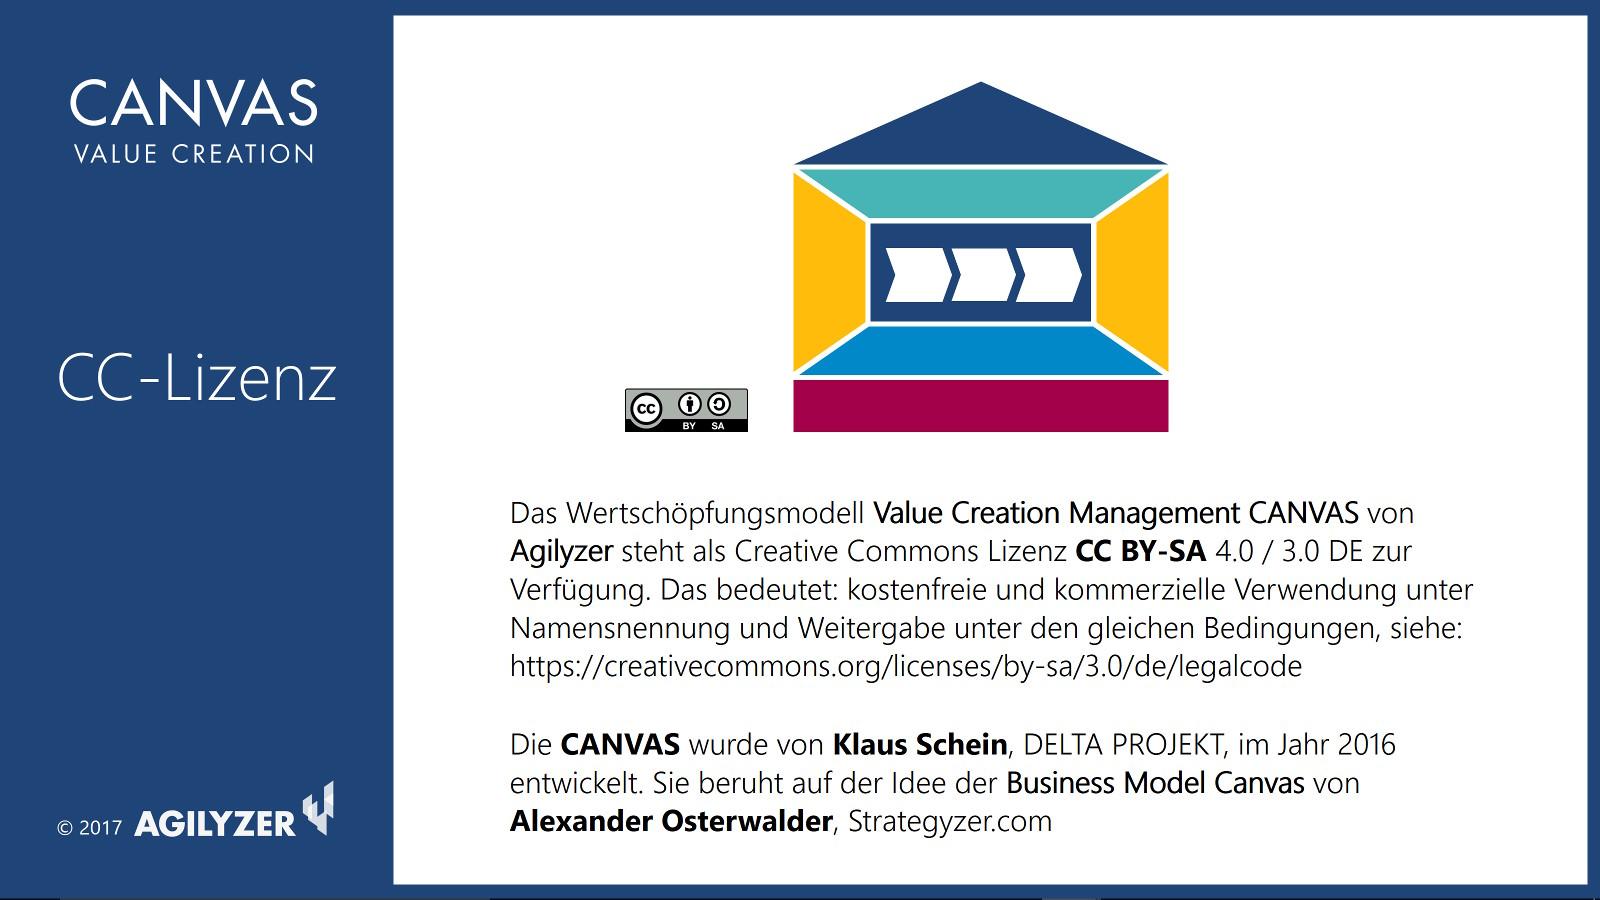 Canvas Slide 10